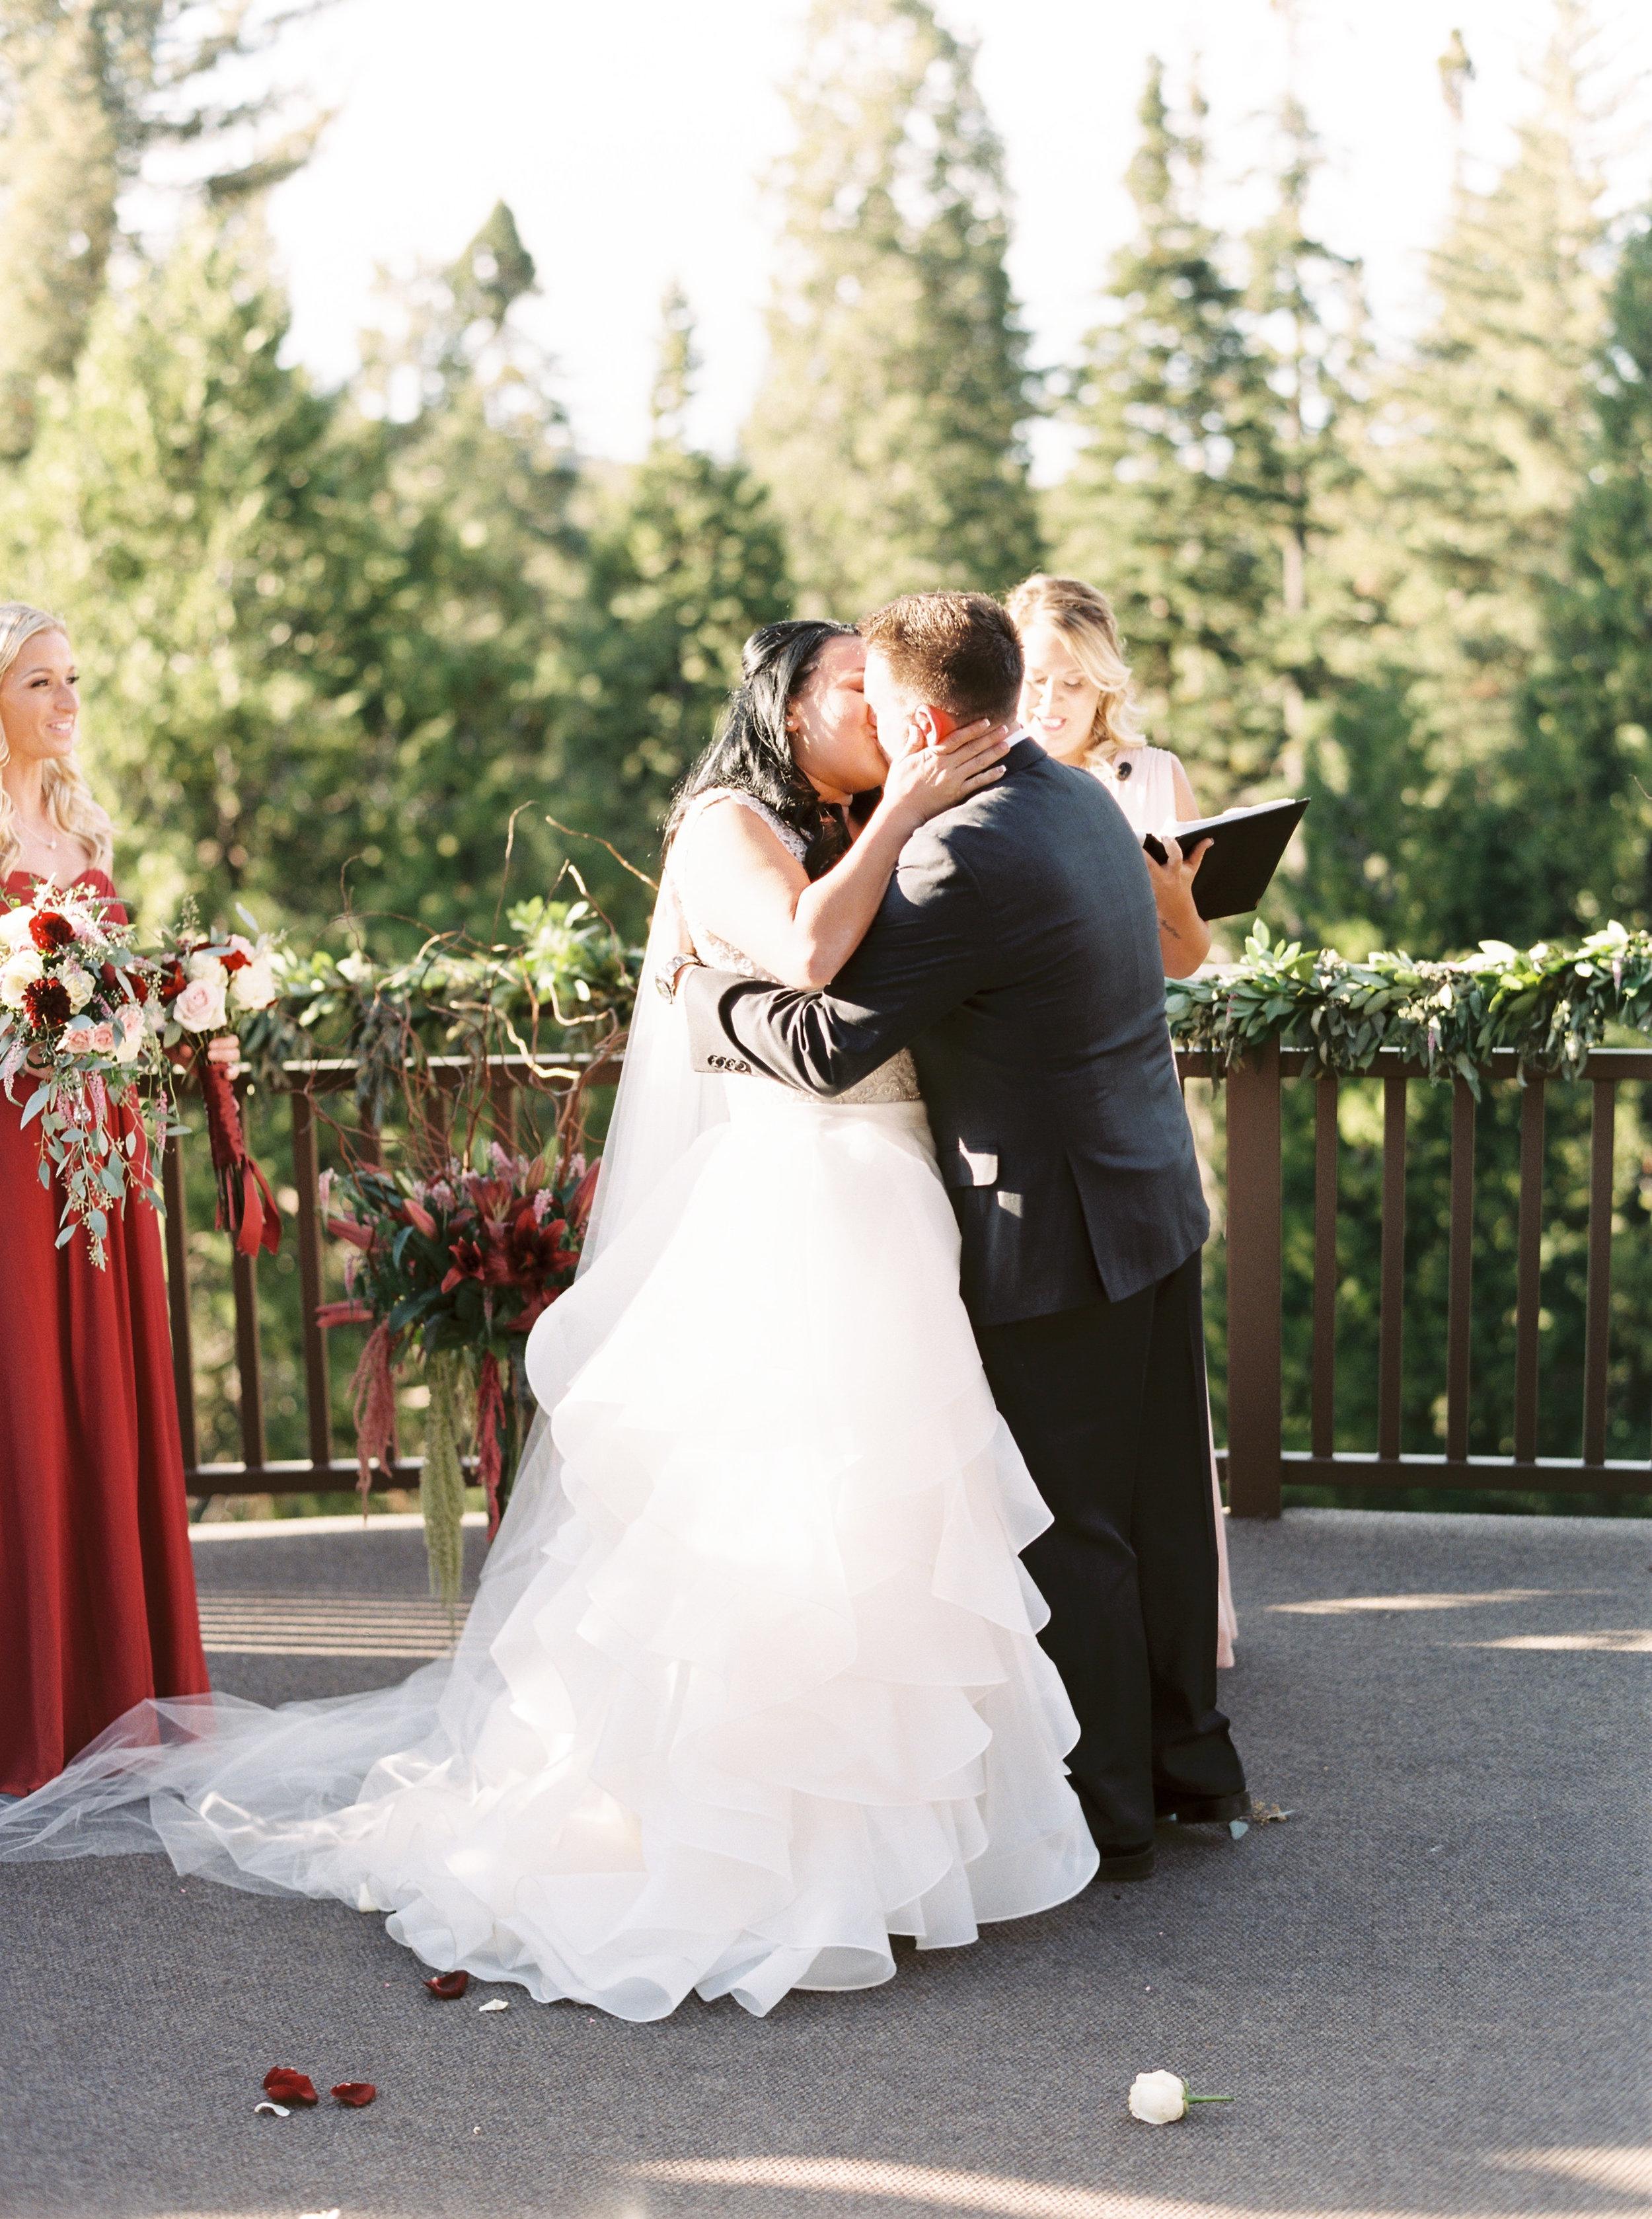 Tenaya-lodge-wedding-at-yosemite-national-park-california-82.jpg